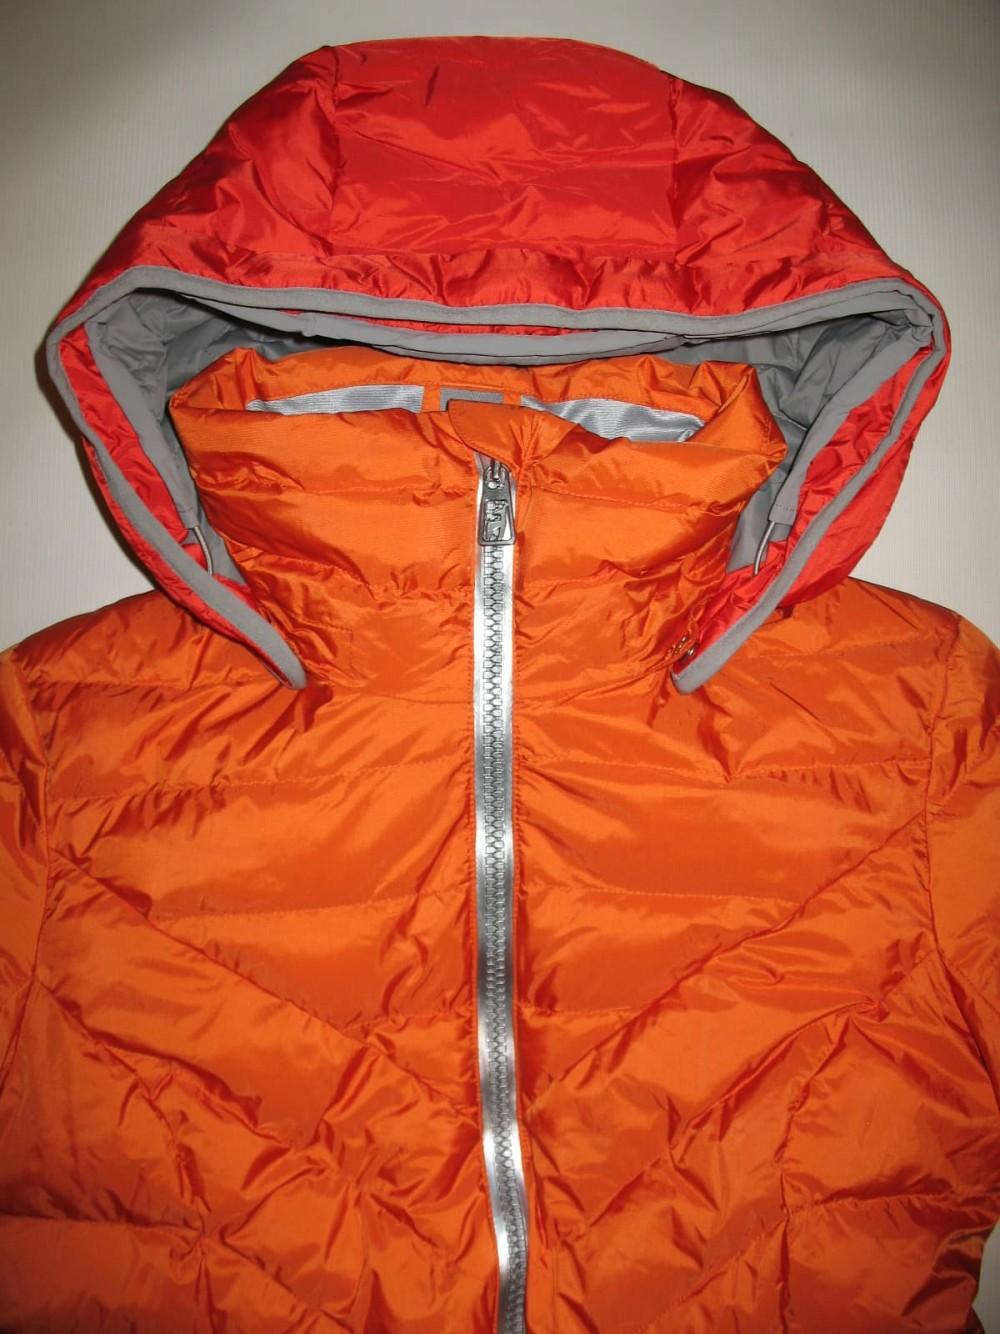 Куртка TONI SAILER clementine quilted ski jacket lady (размер 36/S) - 8